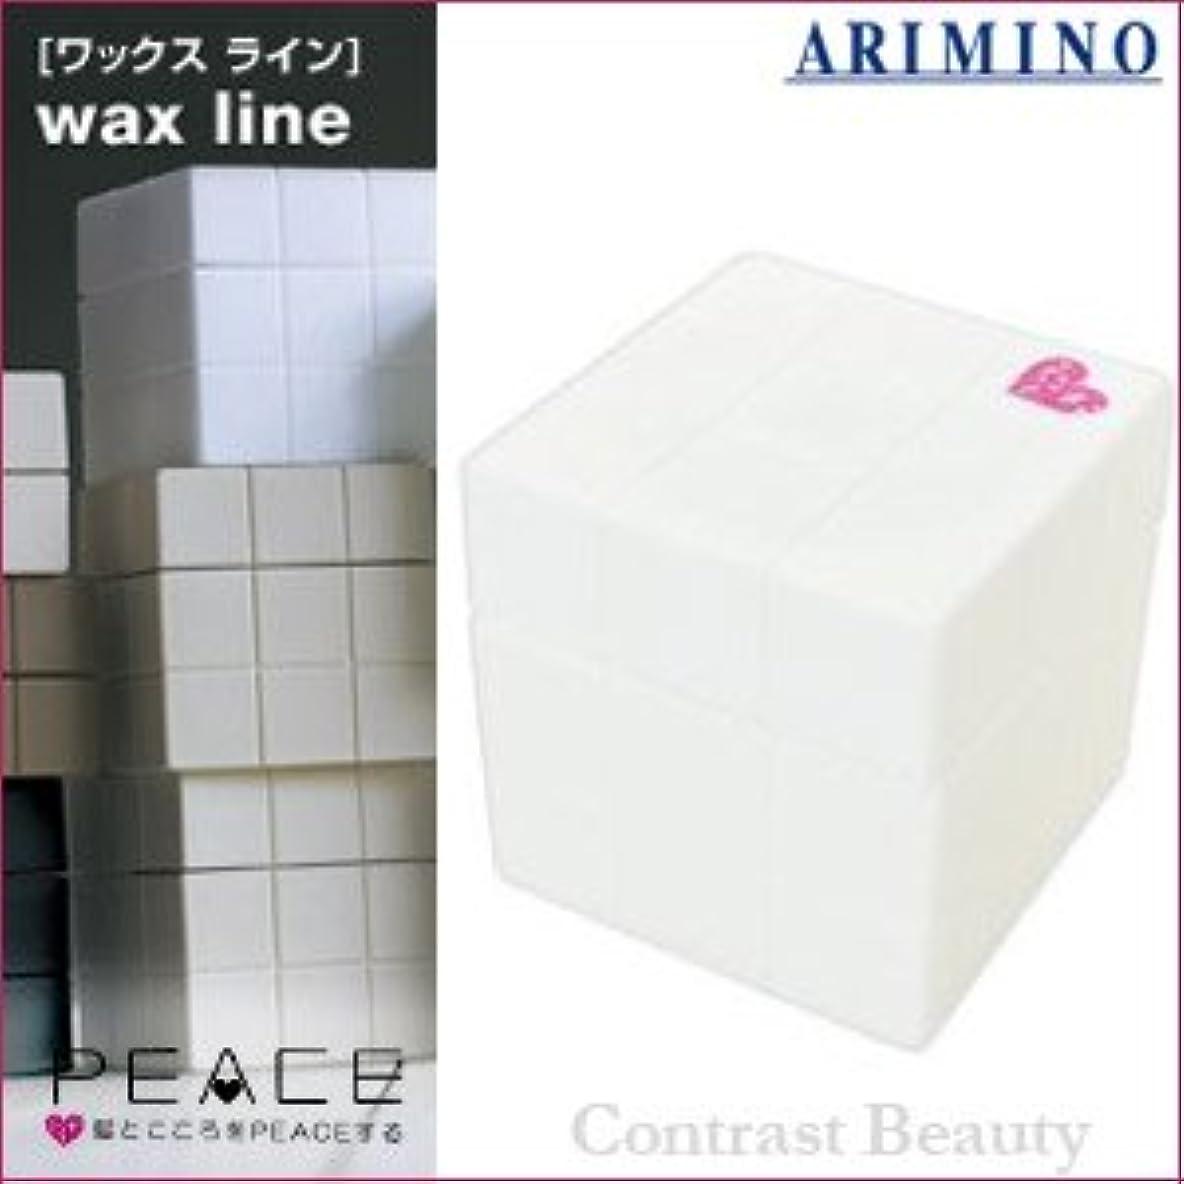 【X5個セット】 アリミノ ピース プロデザインシリーズ グロスワックス ホワイト 80g ARIMINO